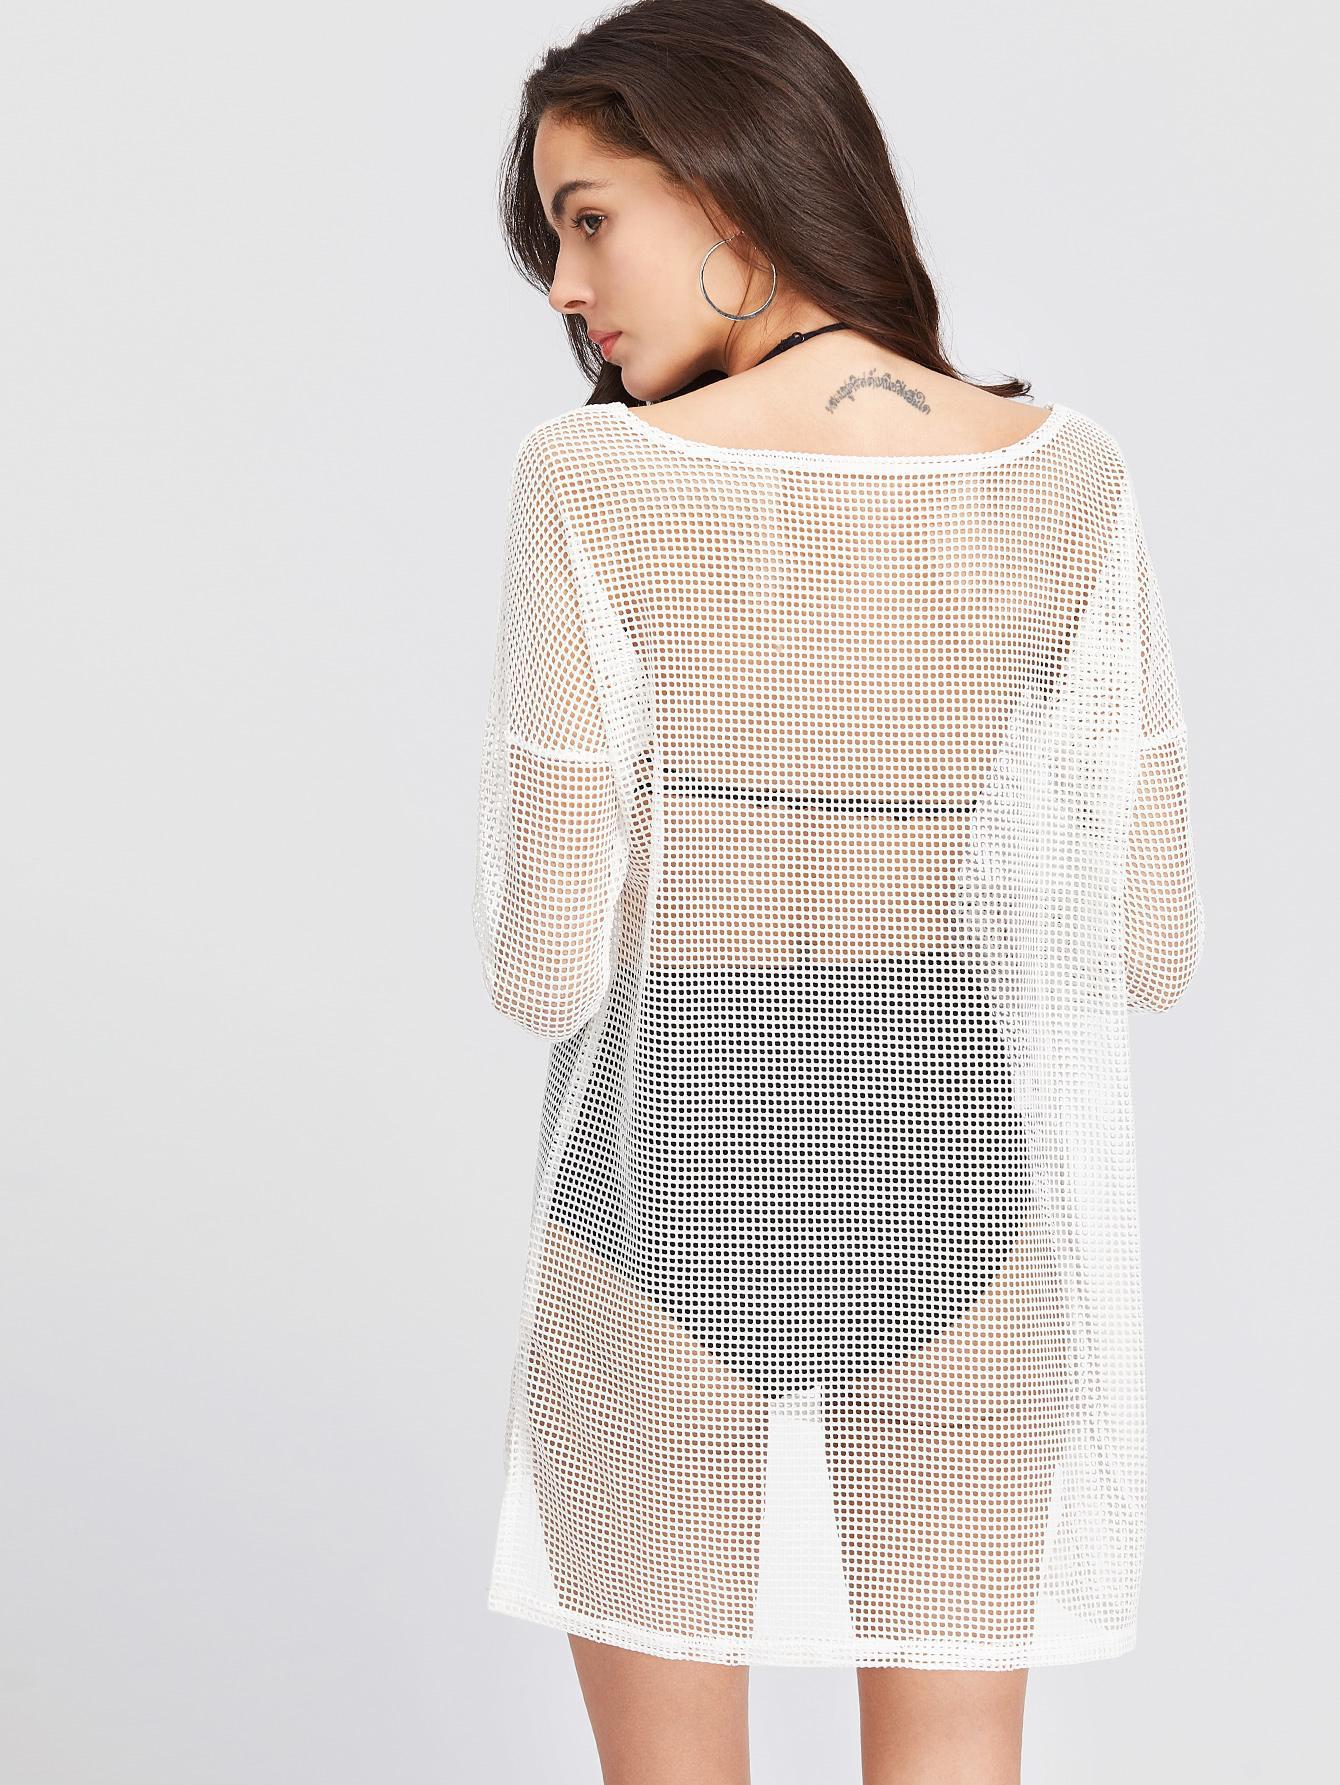 shop judwaa2, taapseepannu, swimwear on seenit - 42357